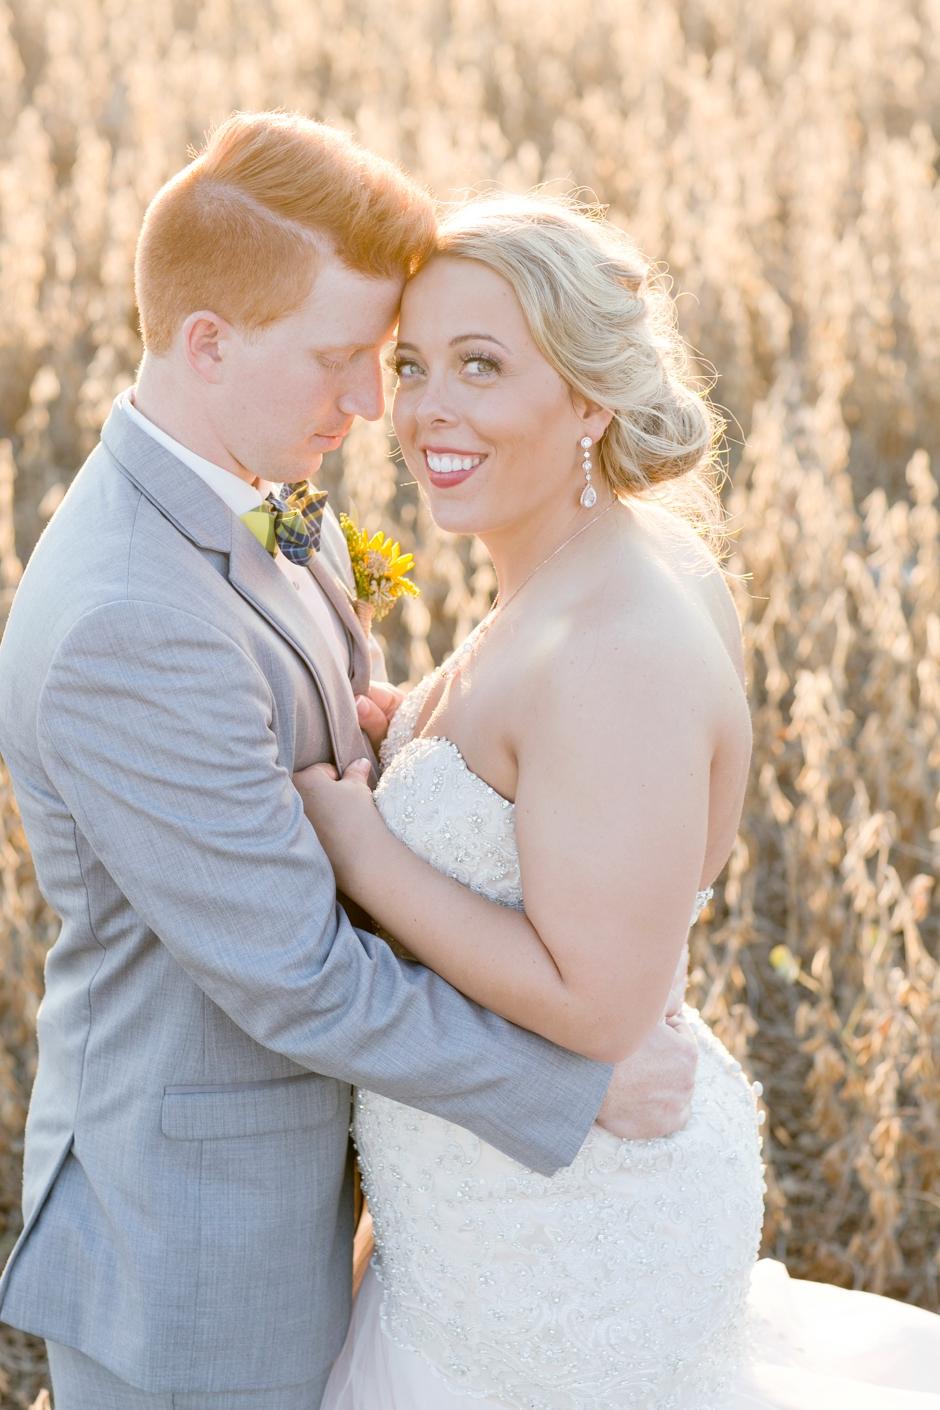 somorset-kentucky-fall-wedding-096.JPG